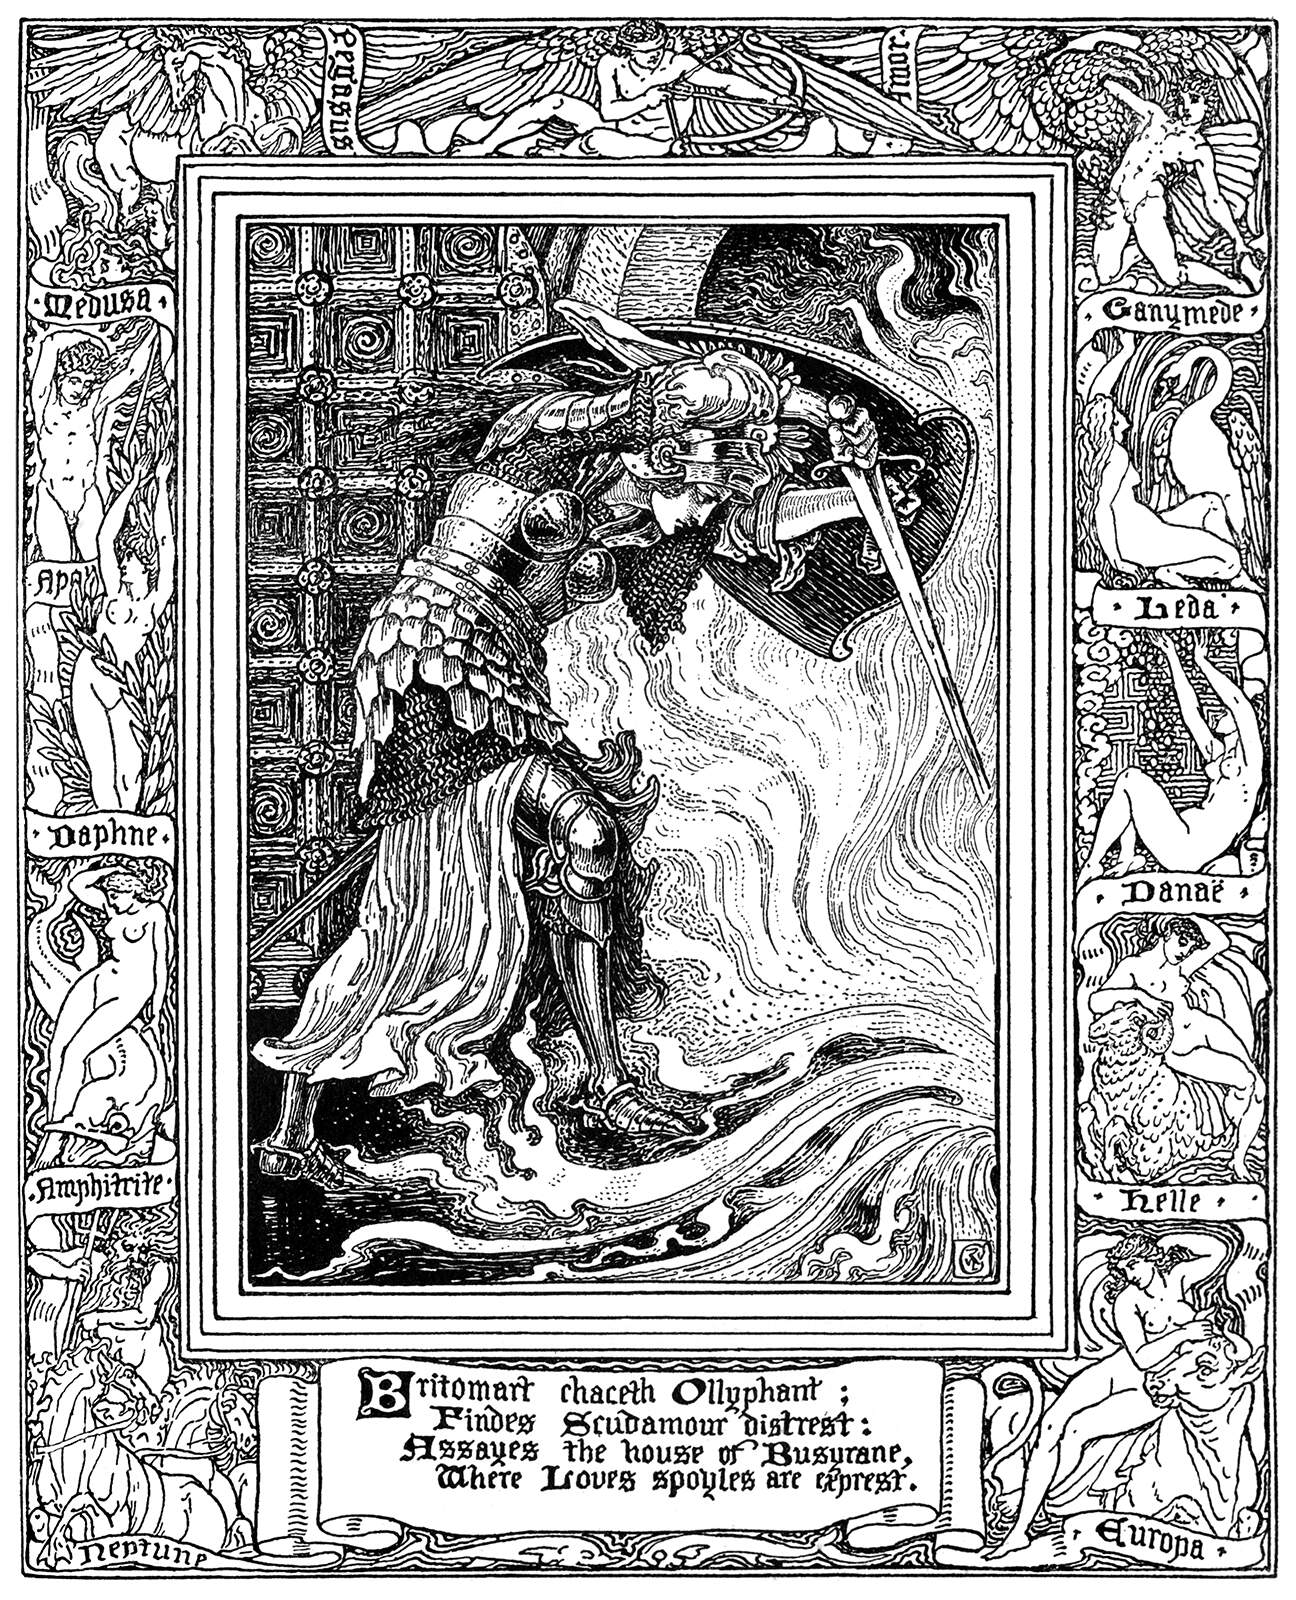 britomart-chaceth-ollyphant-1600.jpg (1296×1600)